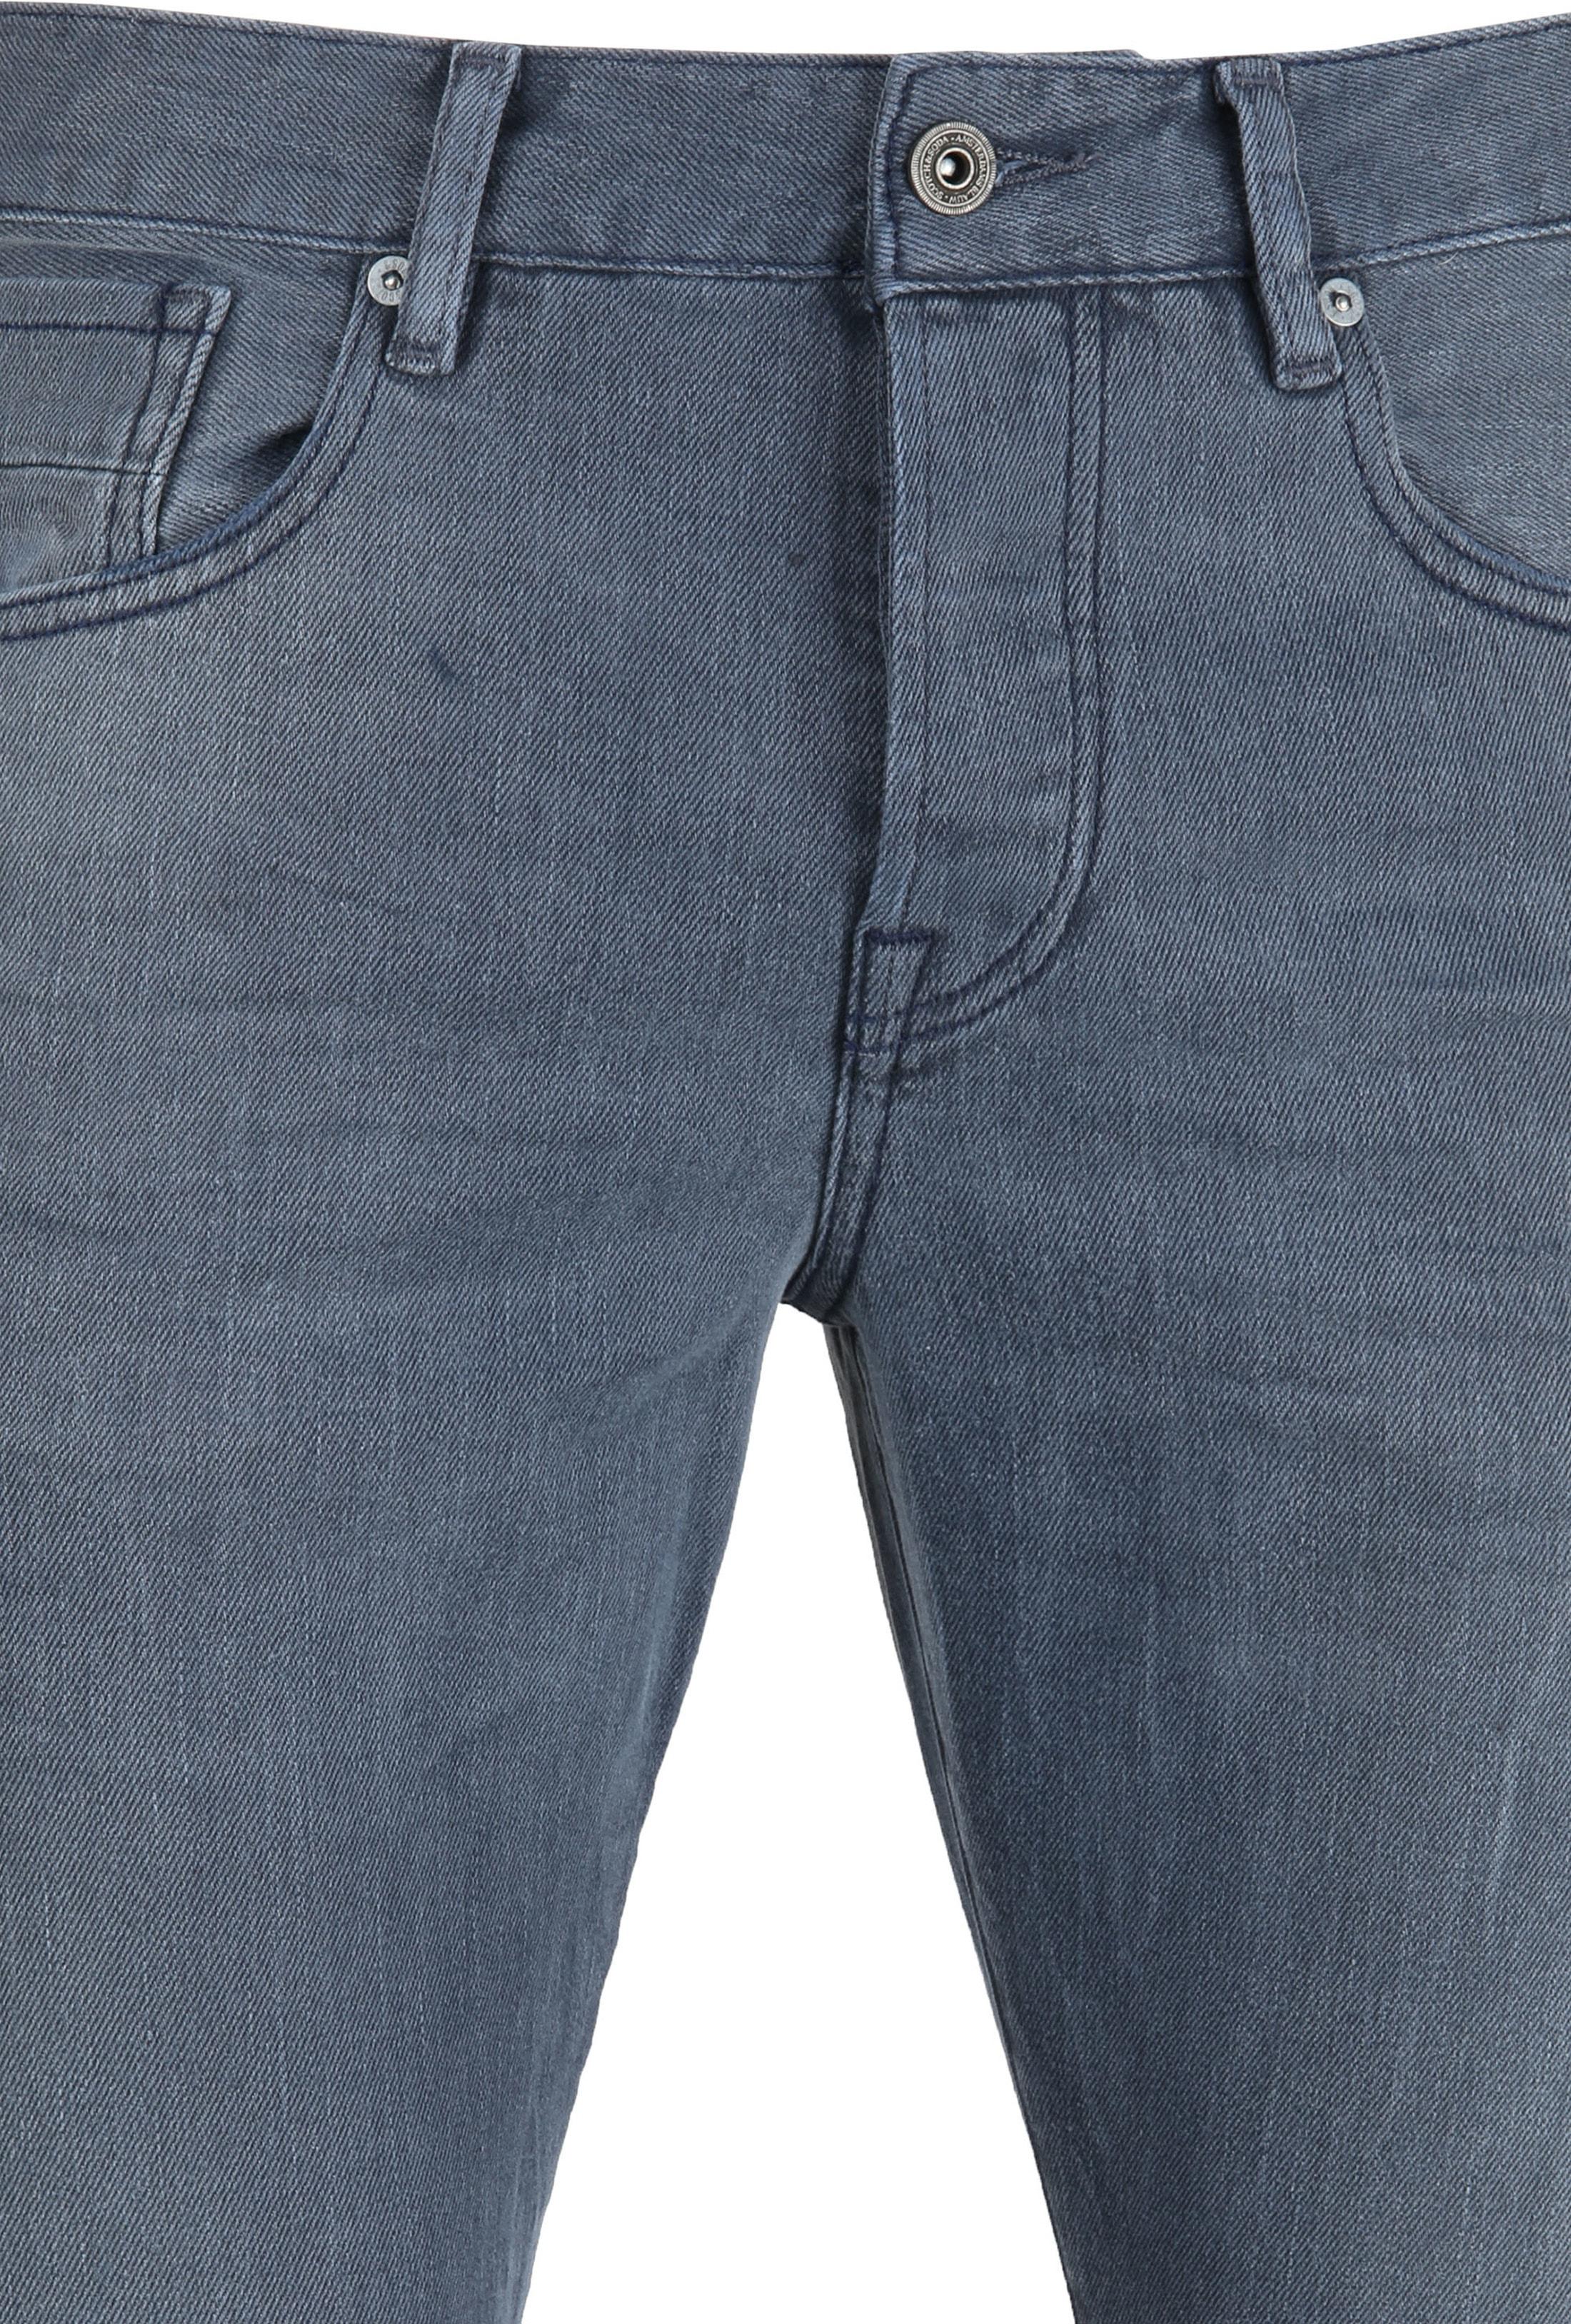 Scotch & Soda Ralston Jeans Concrete Bleach foto 1